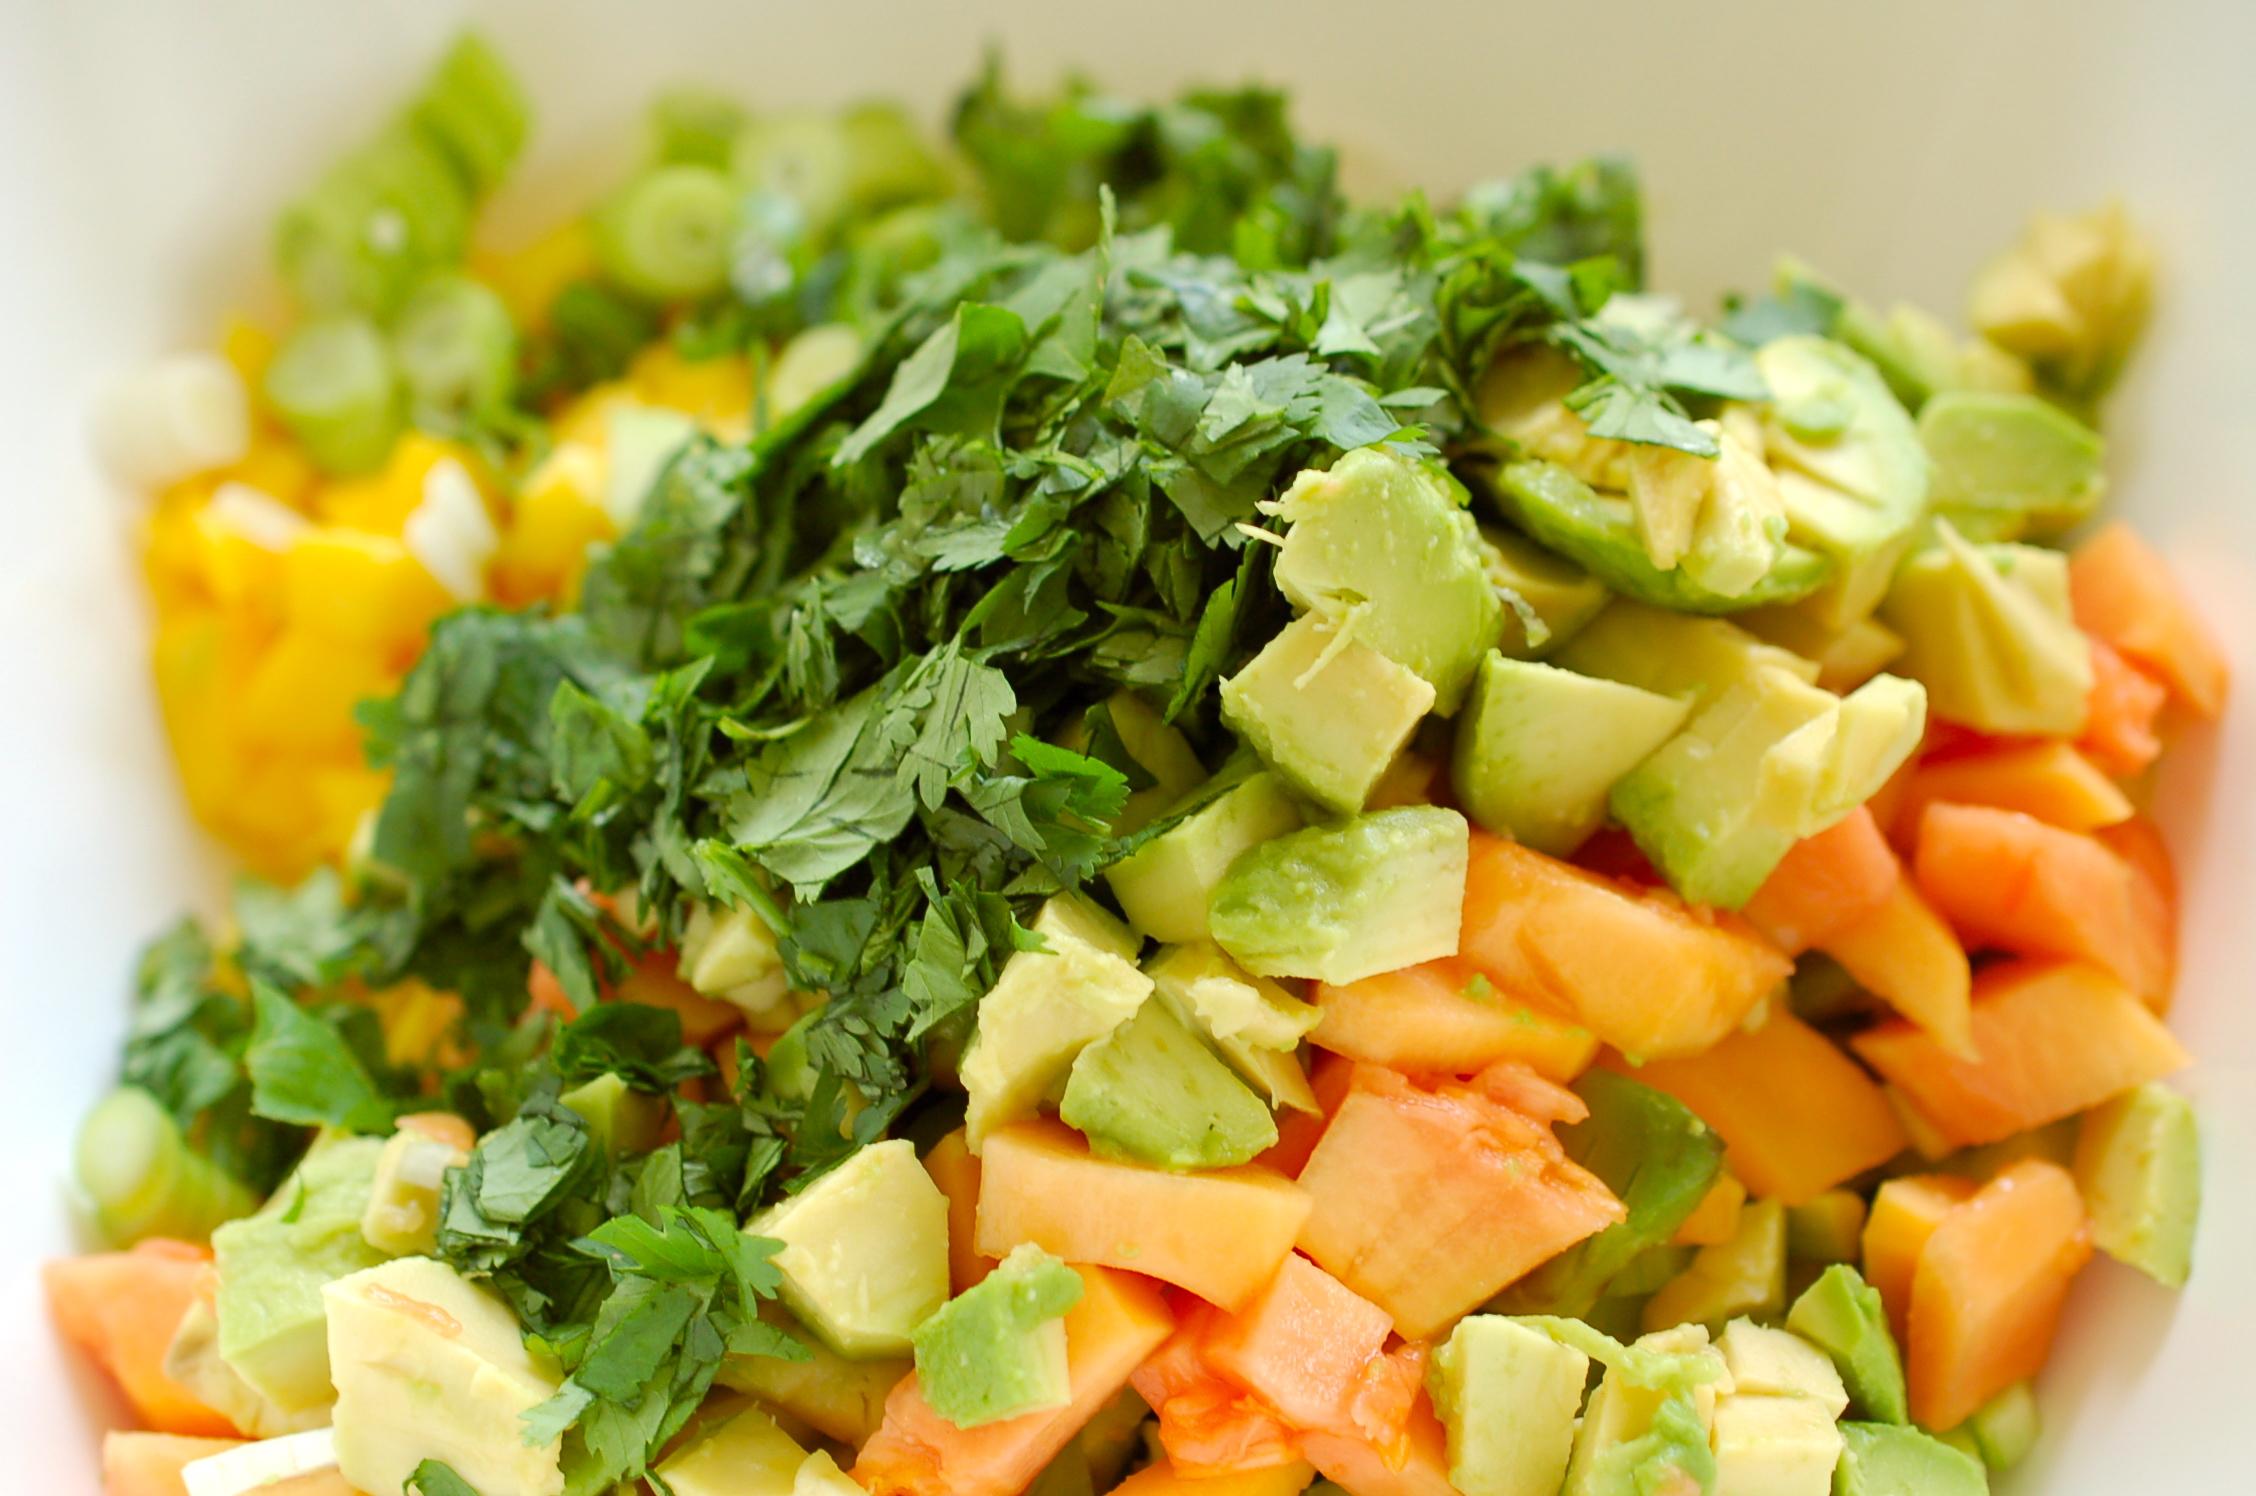 avocado obst salsa salat ist mein liebster sommersalat sommerrezept. Black Bedroom Furniture Sets. Home Design Ideas